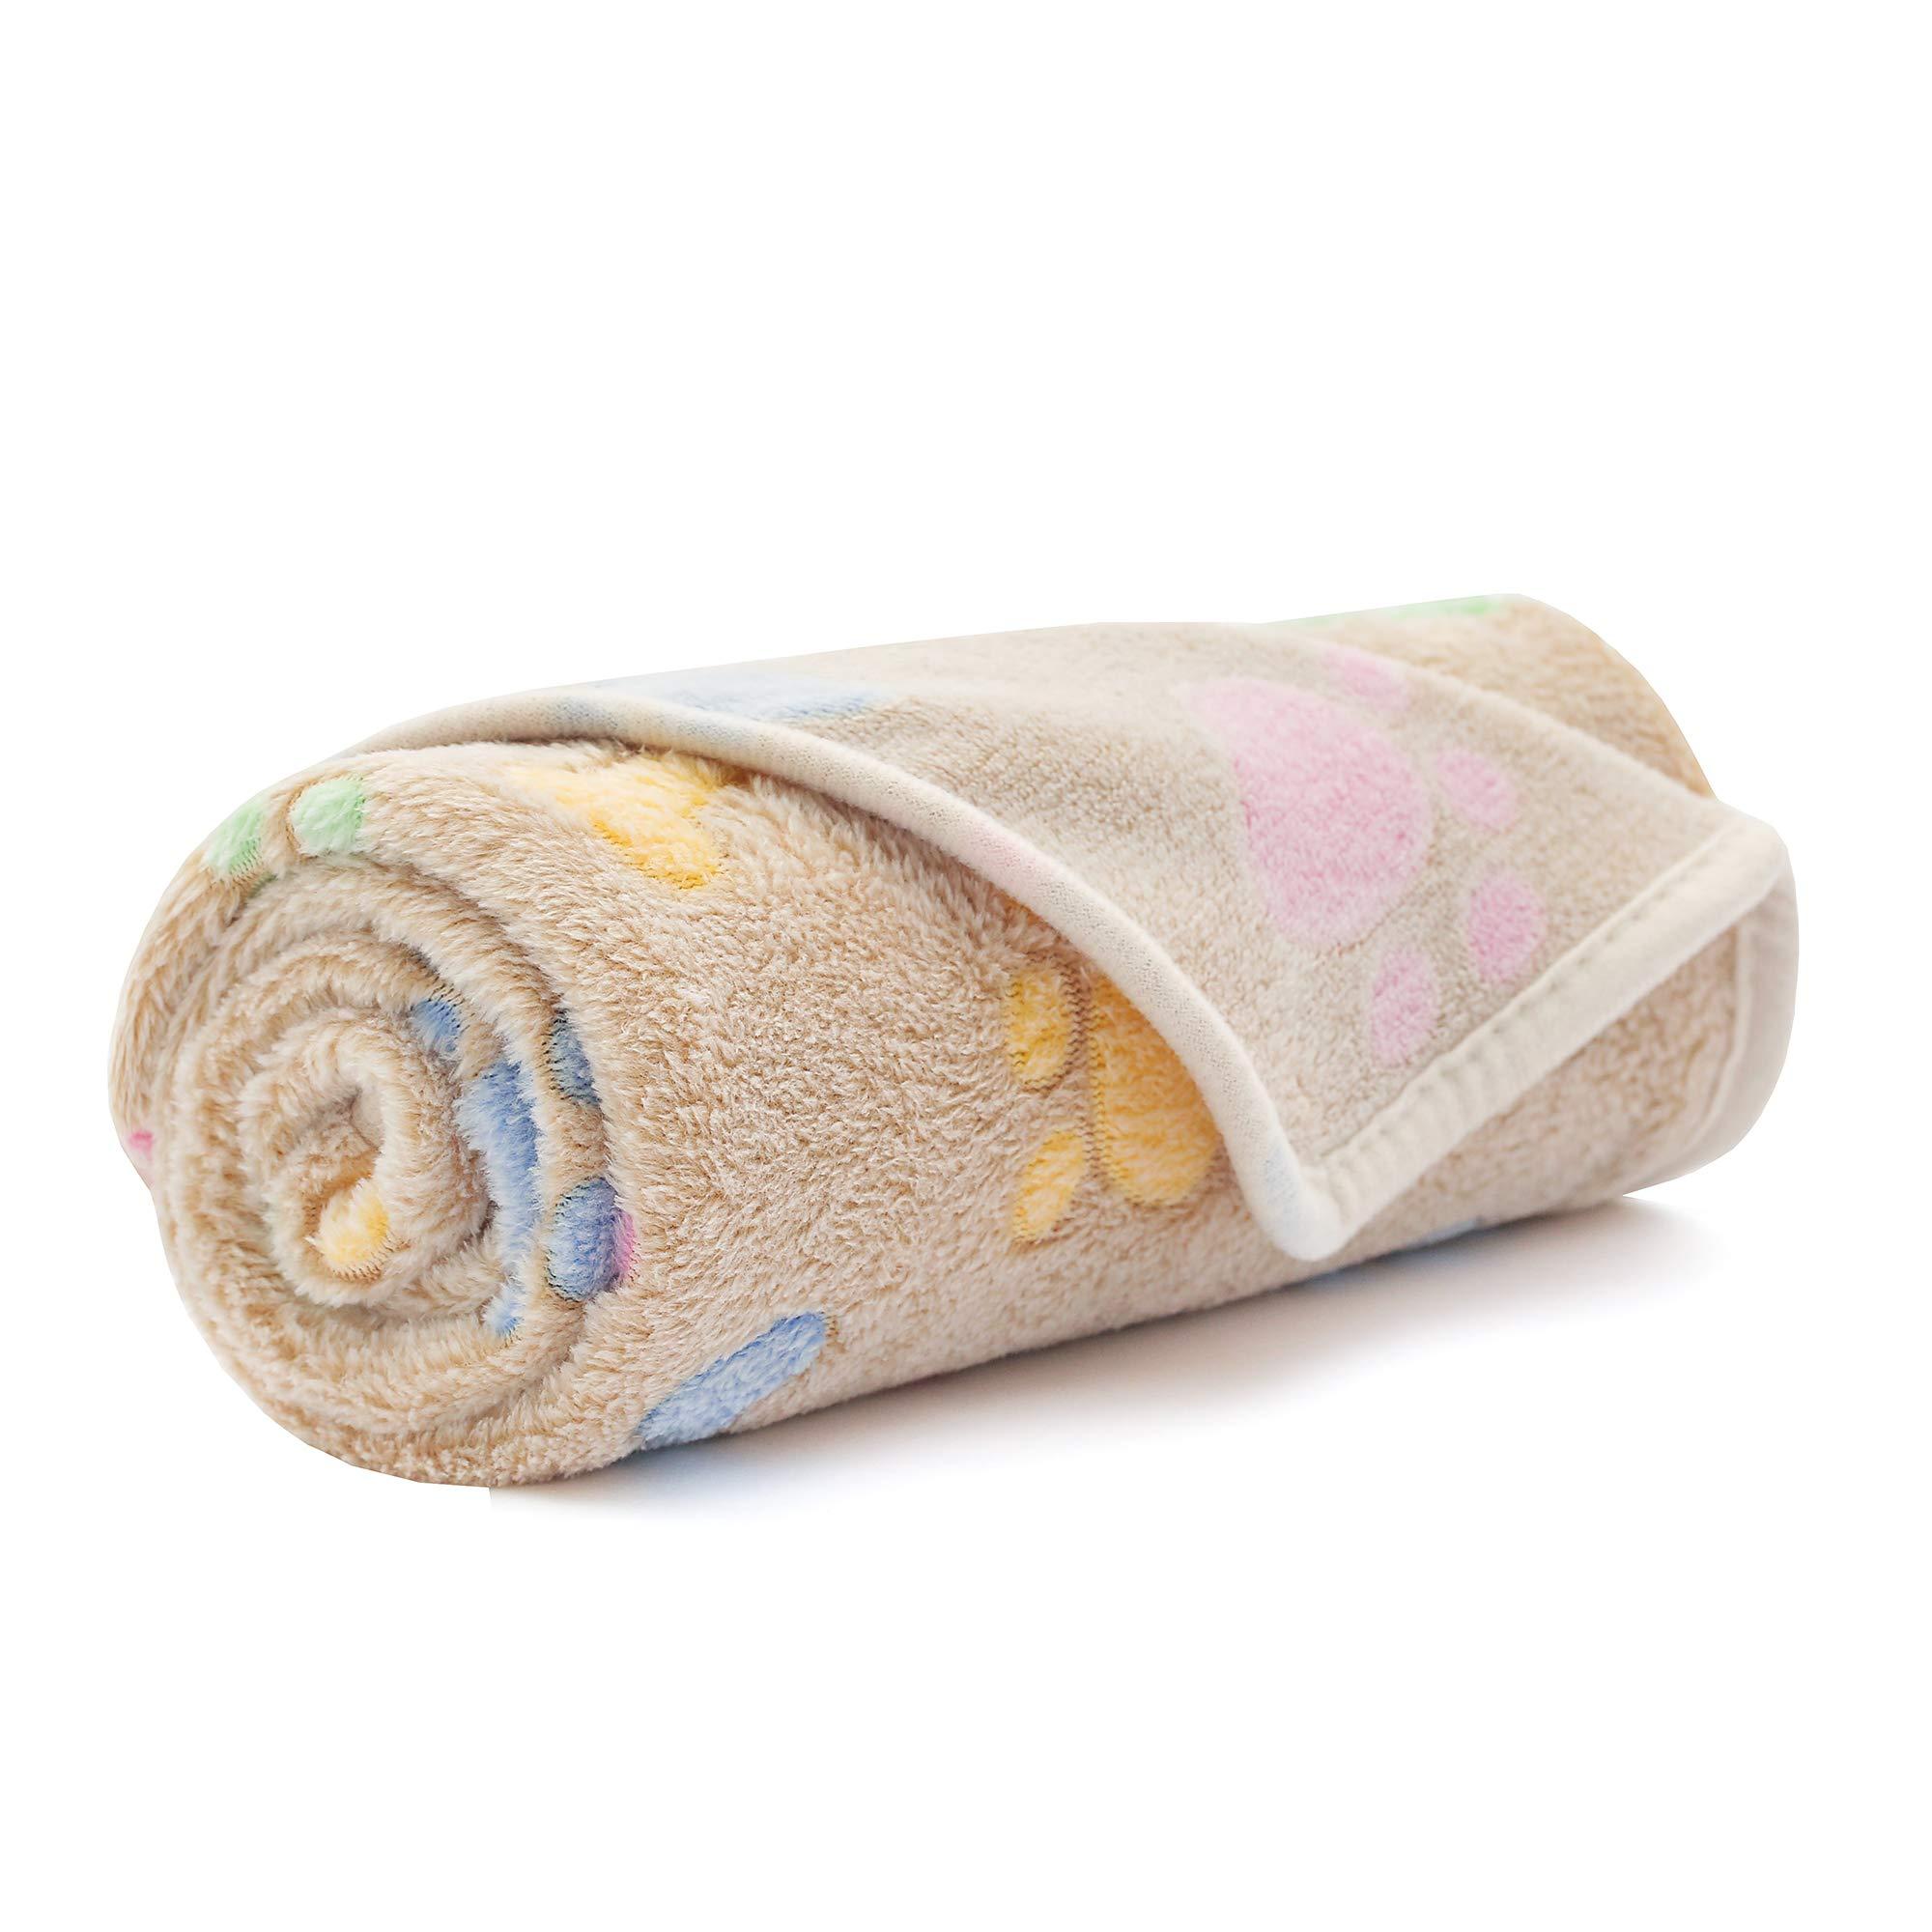 "Luciphia Super Soft Premium Fluffy Fleece Dog Blankets for Puppy Cat Pets Coffee Bone,Small(31""x27"")"